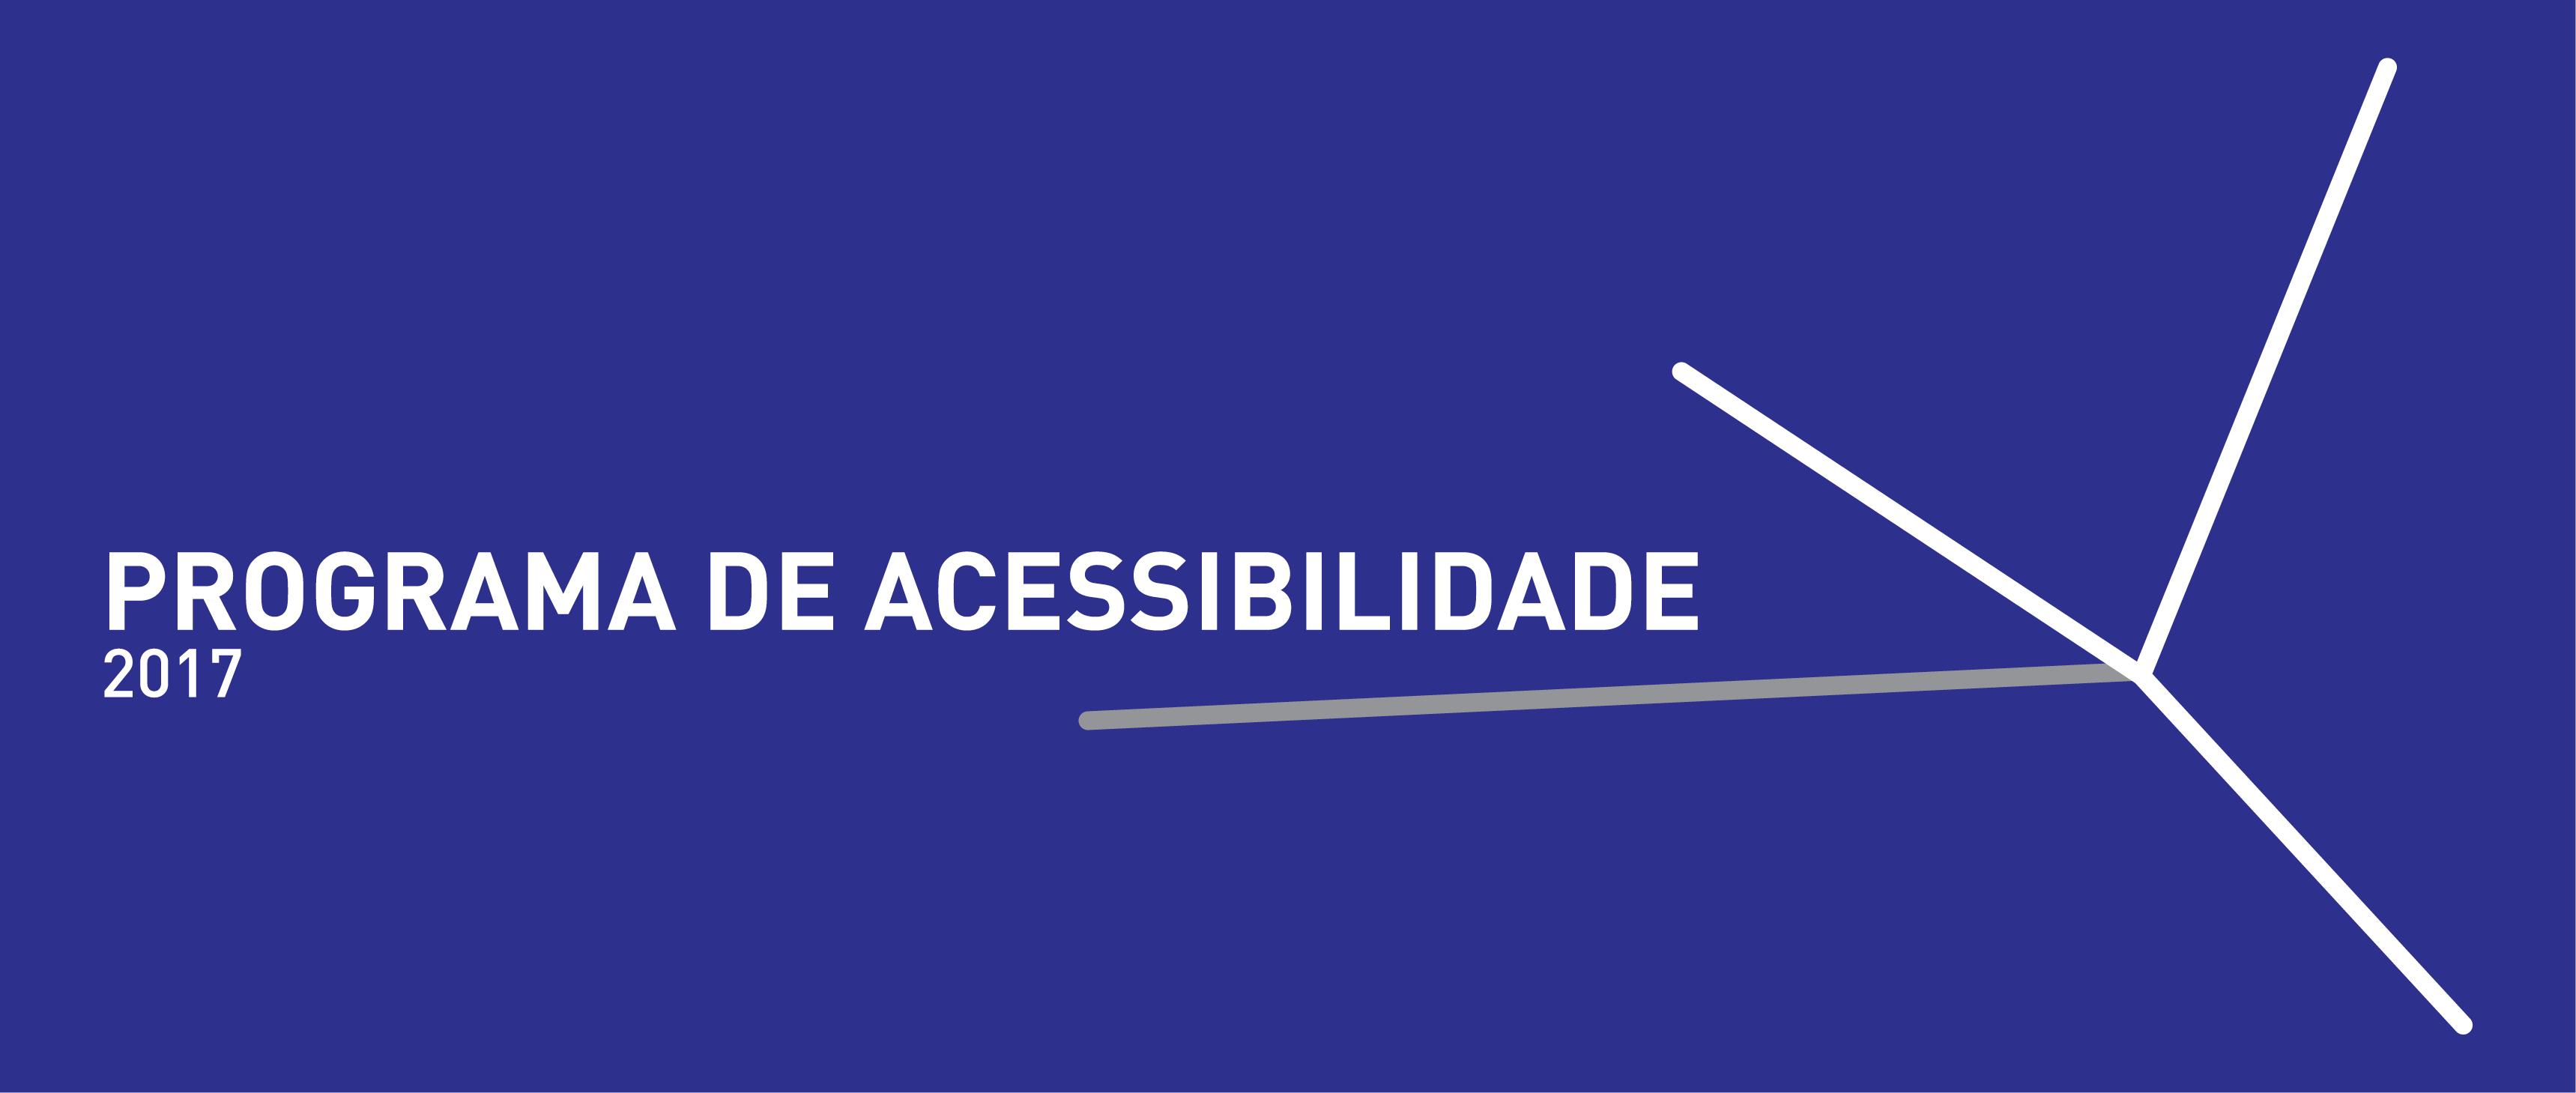 Programa de Acessibilidade